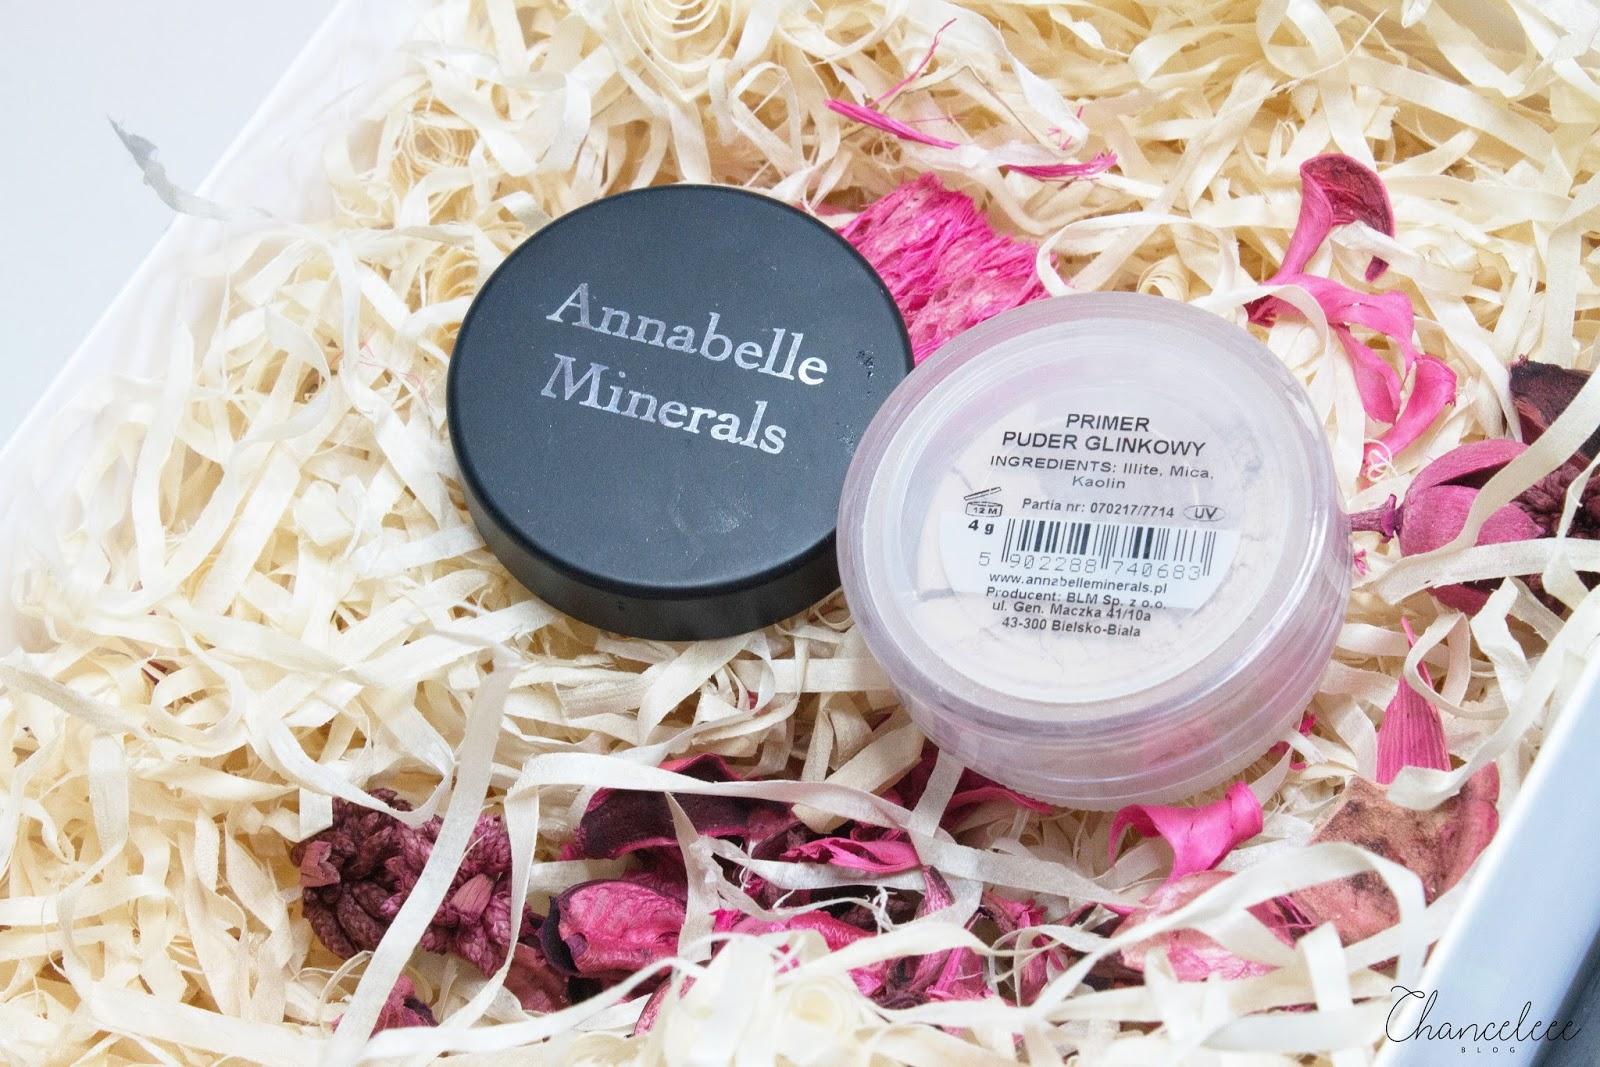 Annabelle Minerals primer puder glinkowy